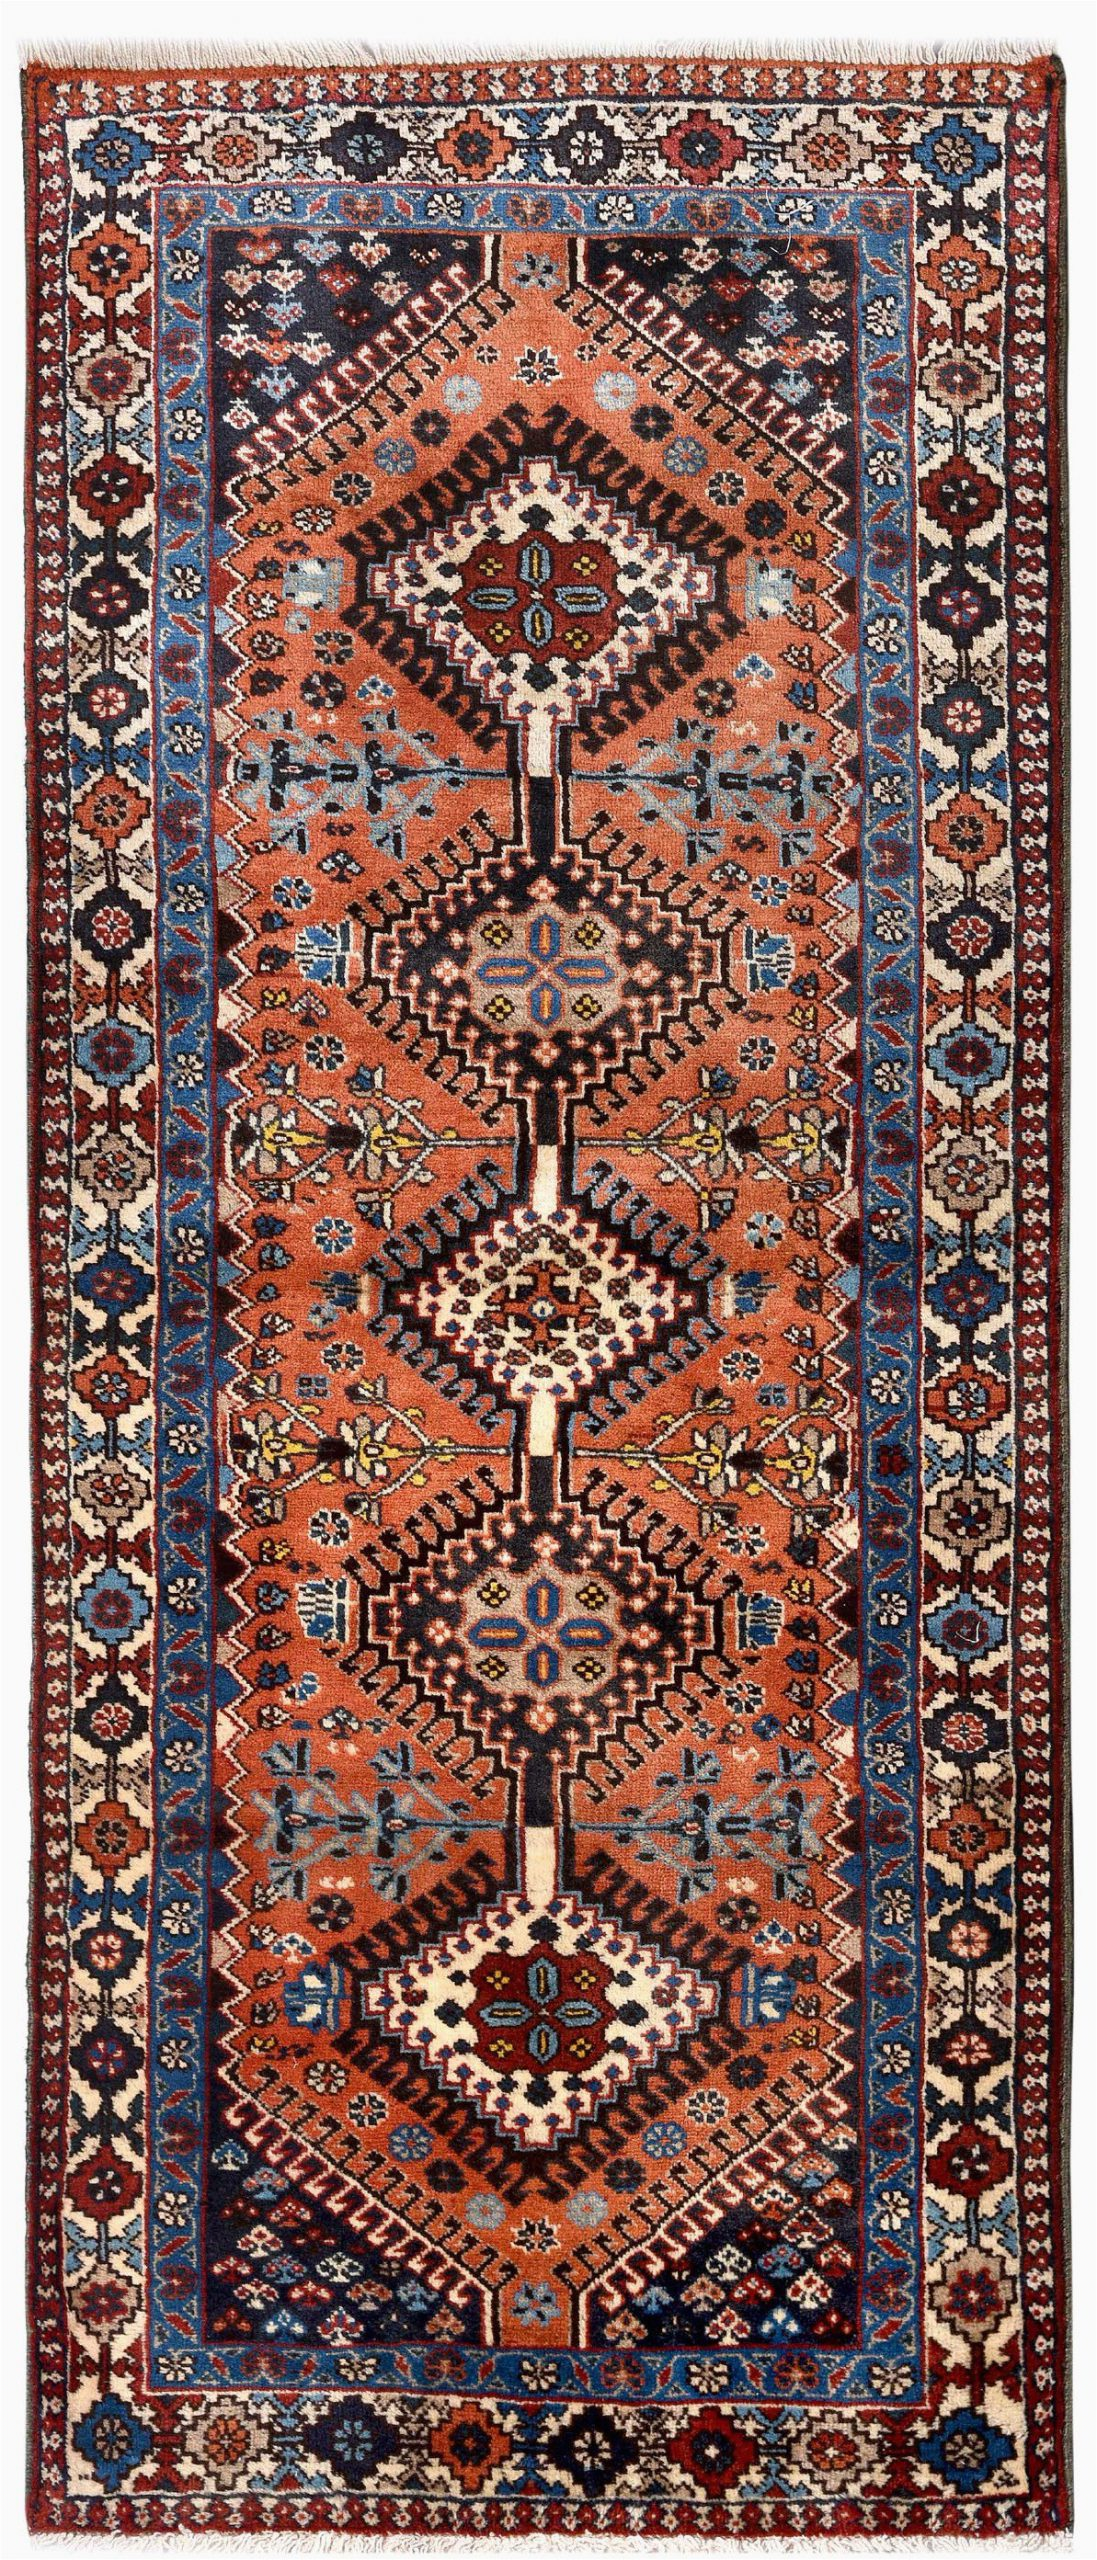 Yalameh runner rug Persian rug for sale DR343 7203